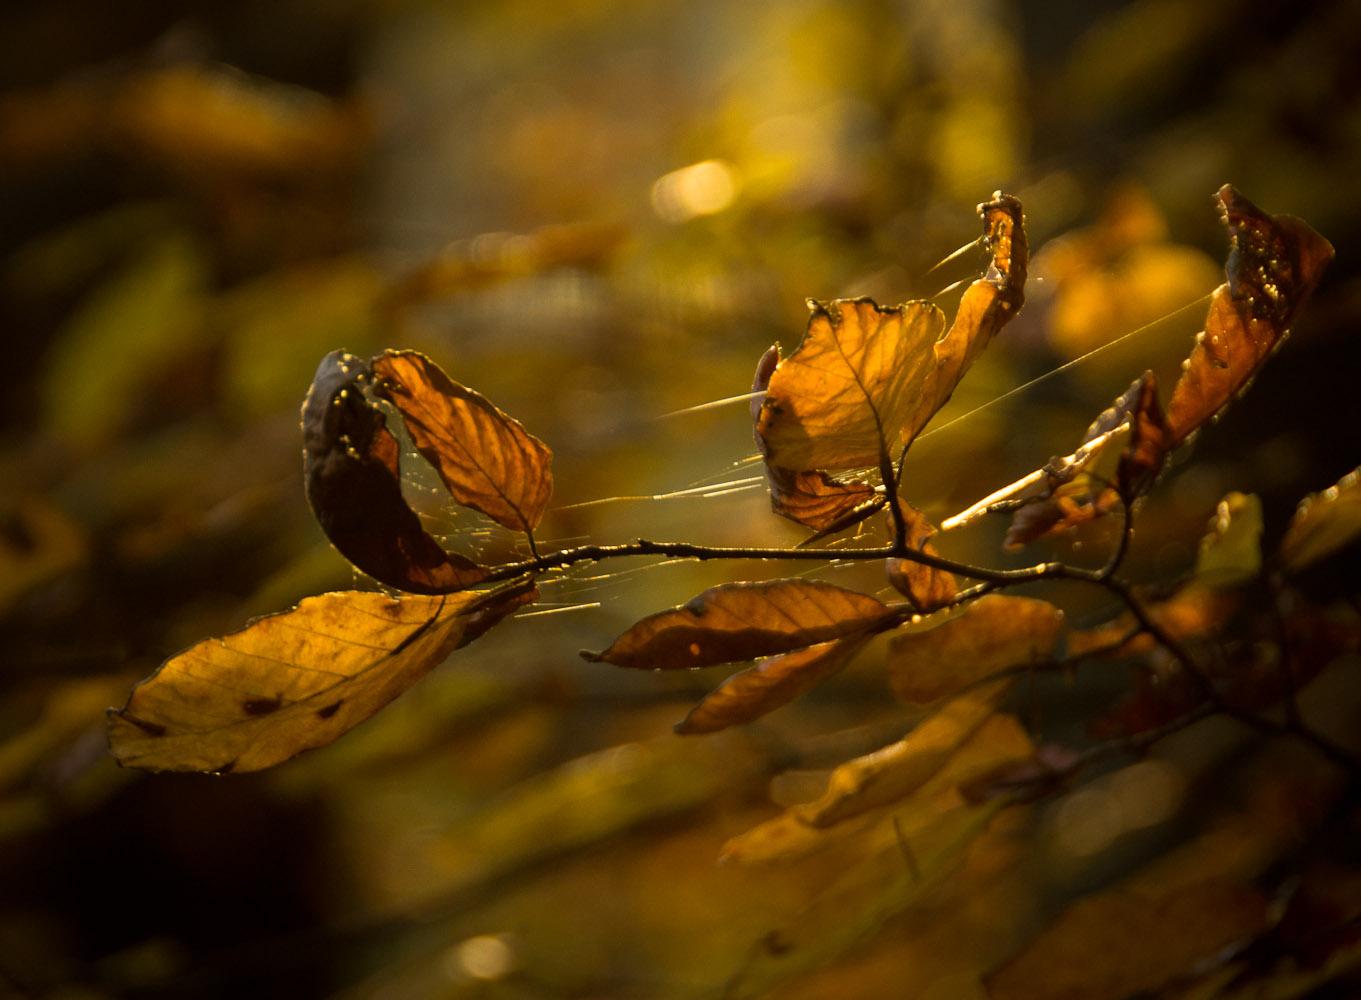 Herbstblätter – outdoor